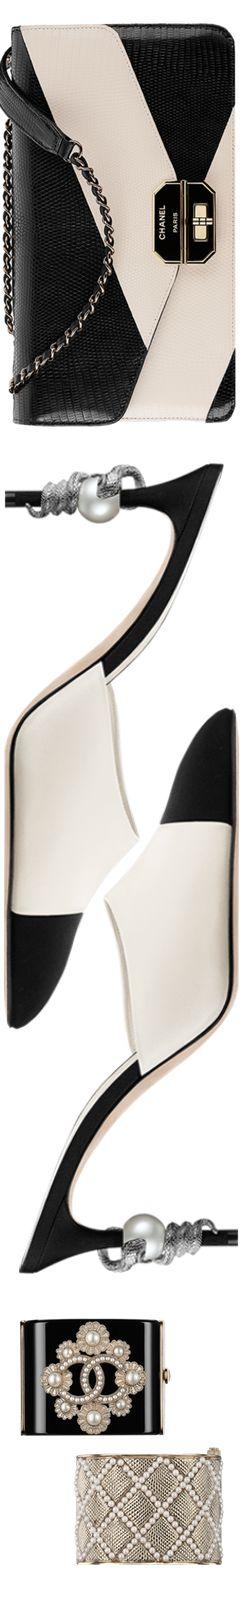 Chanel 2015/2016 Métiers d'Art accessories